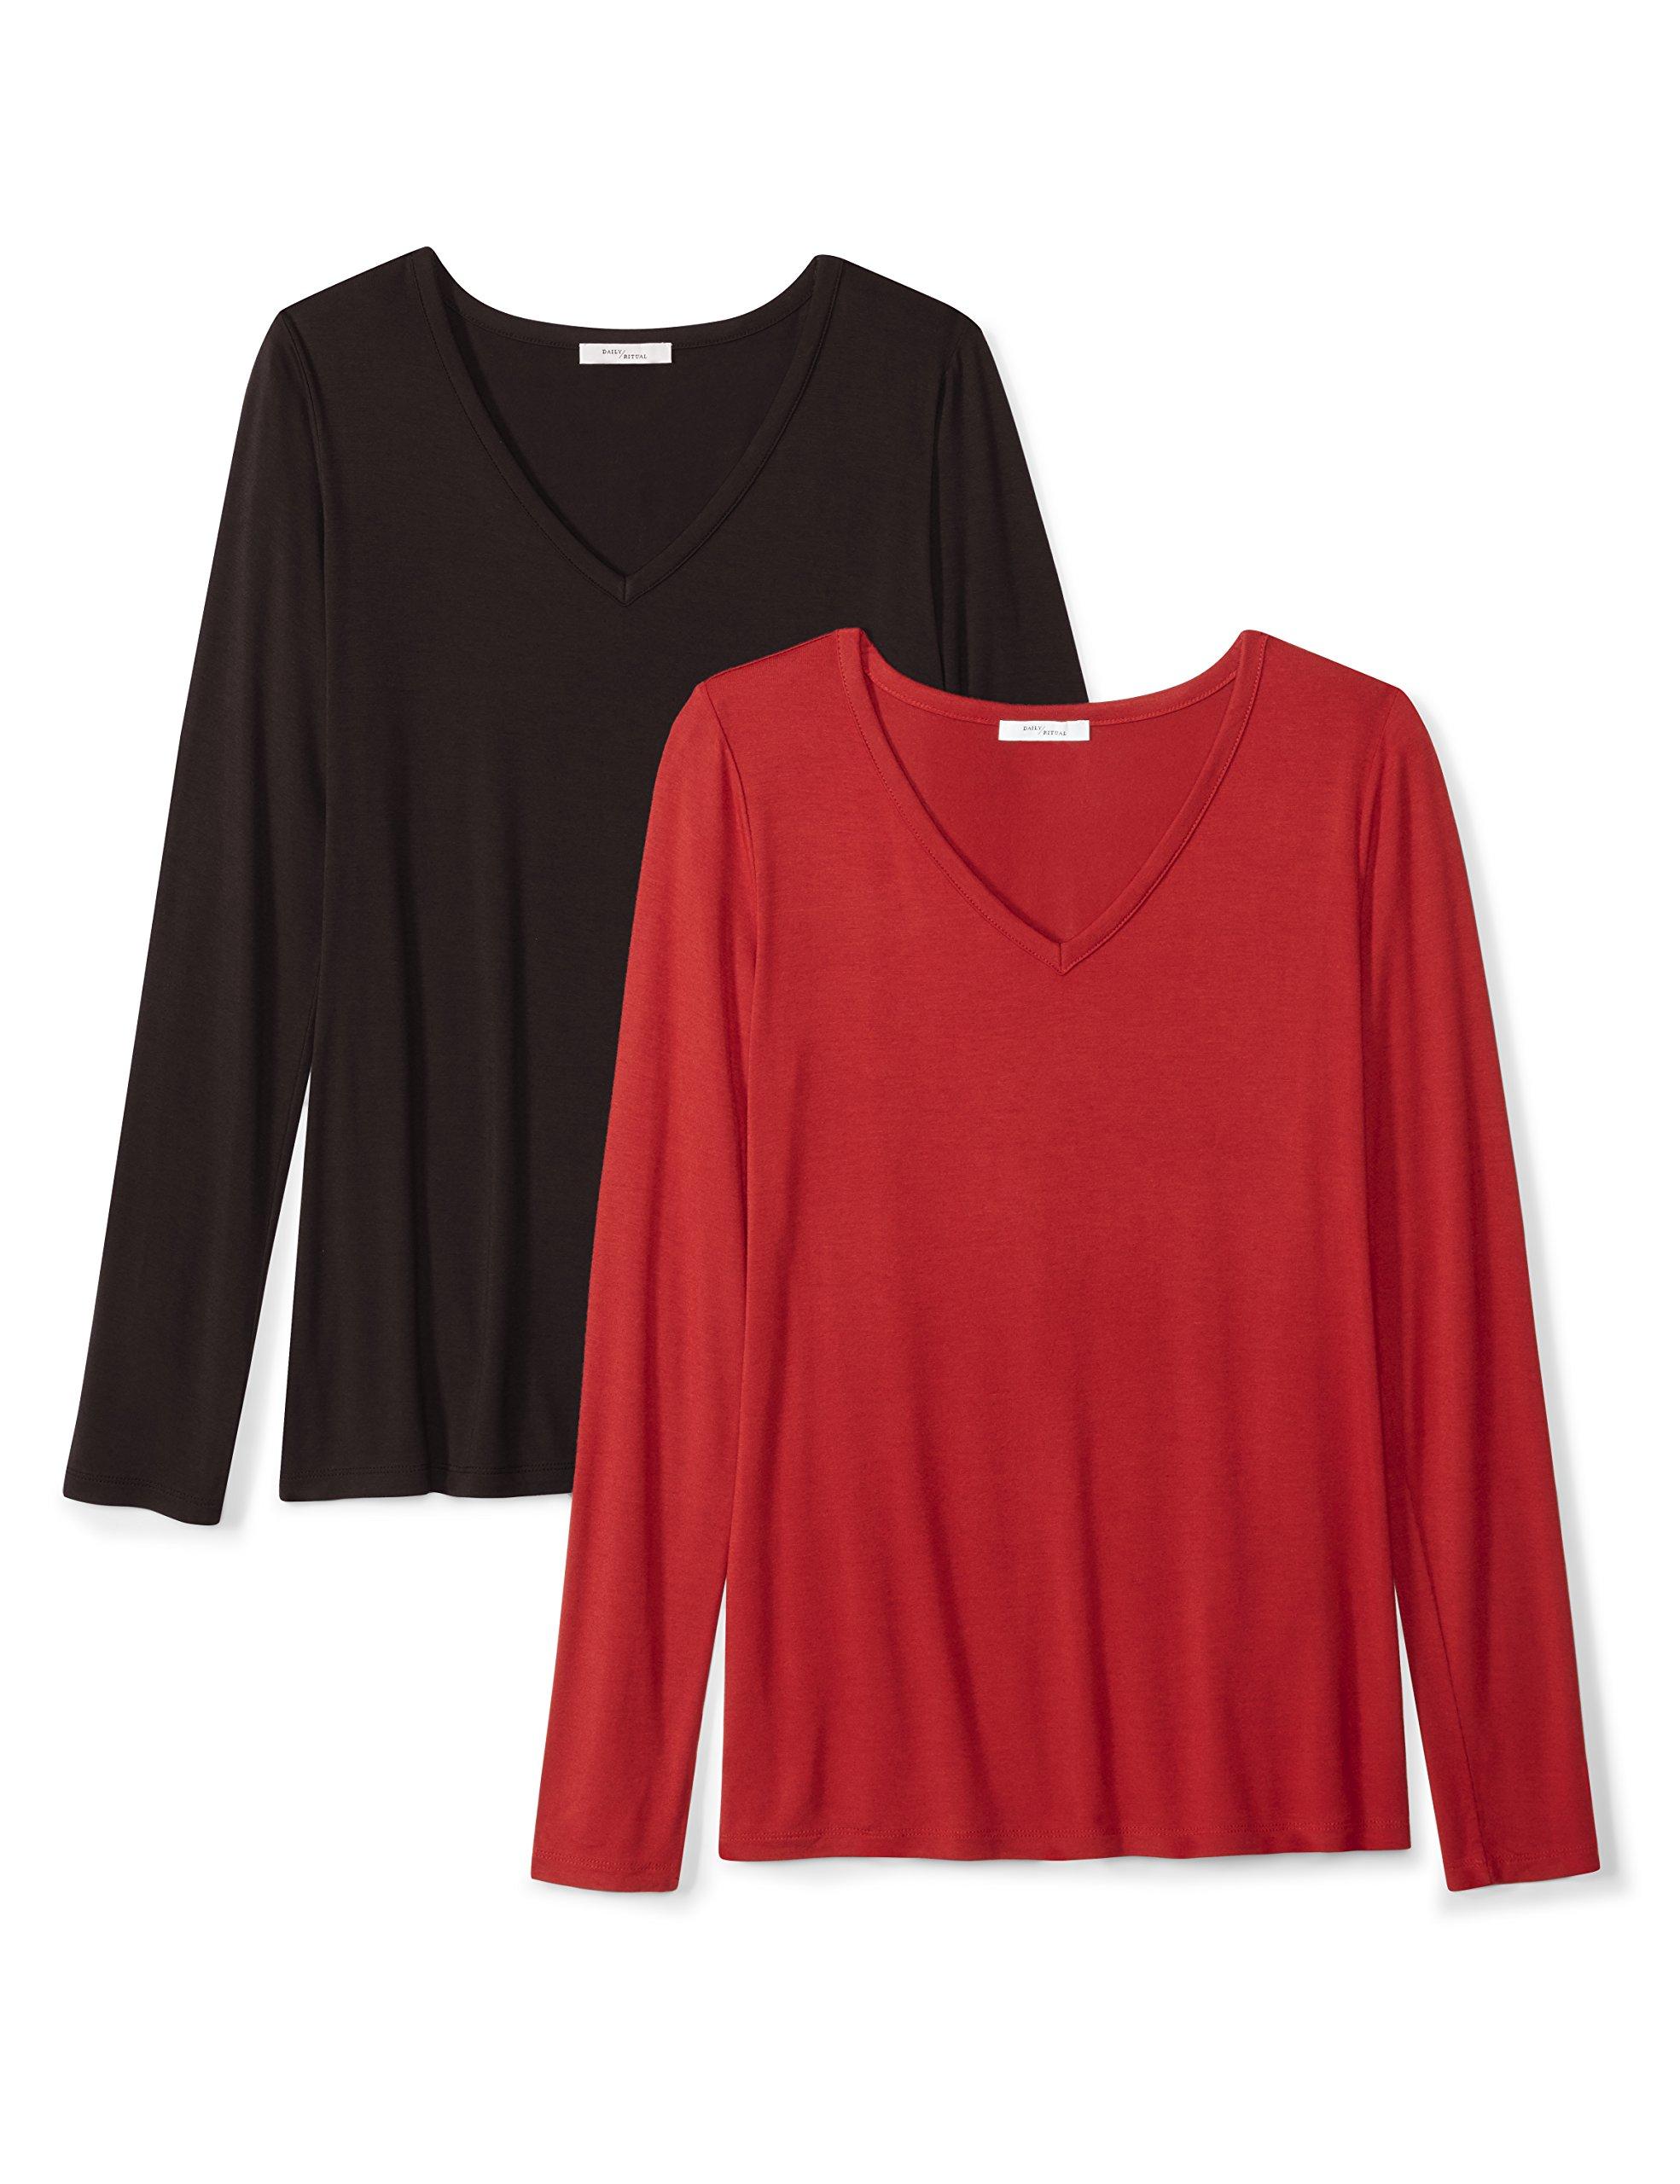 Daily Ritual Women's Jersey Long-Sleeve V-Neck T-Shirt, 2-Pack, XXL, Black/Deep Red